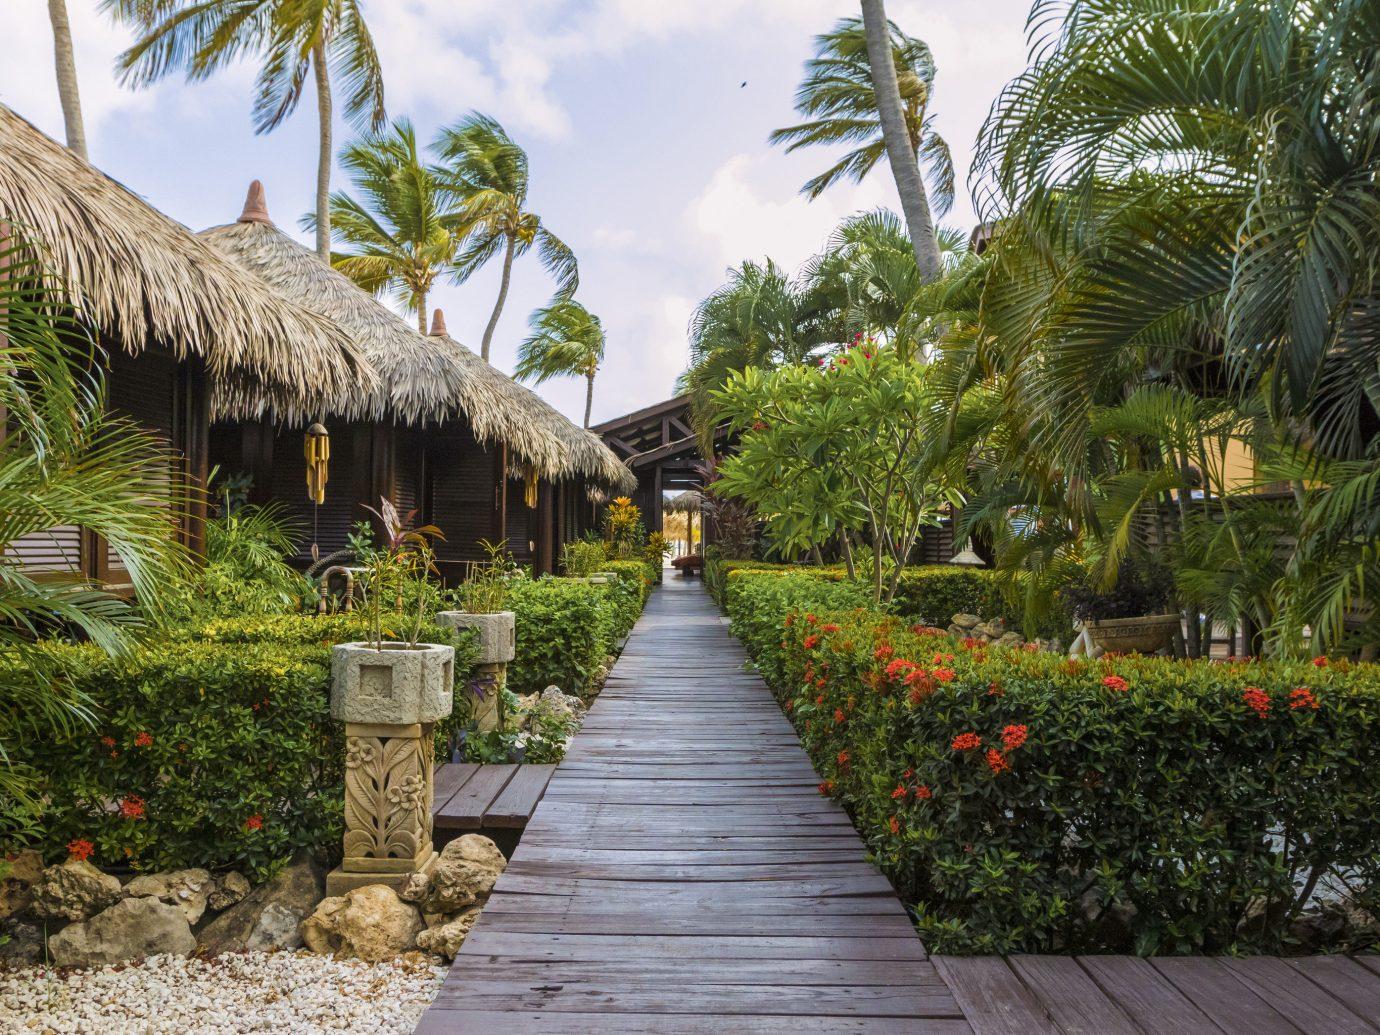 Aruba caribbean Hotels tree outdoor walkway botany Resort vacation Garden arecales flower plant estate botanical garden palm family tropics palm stone